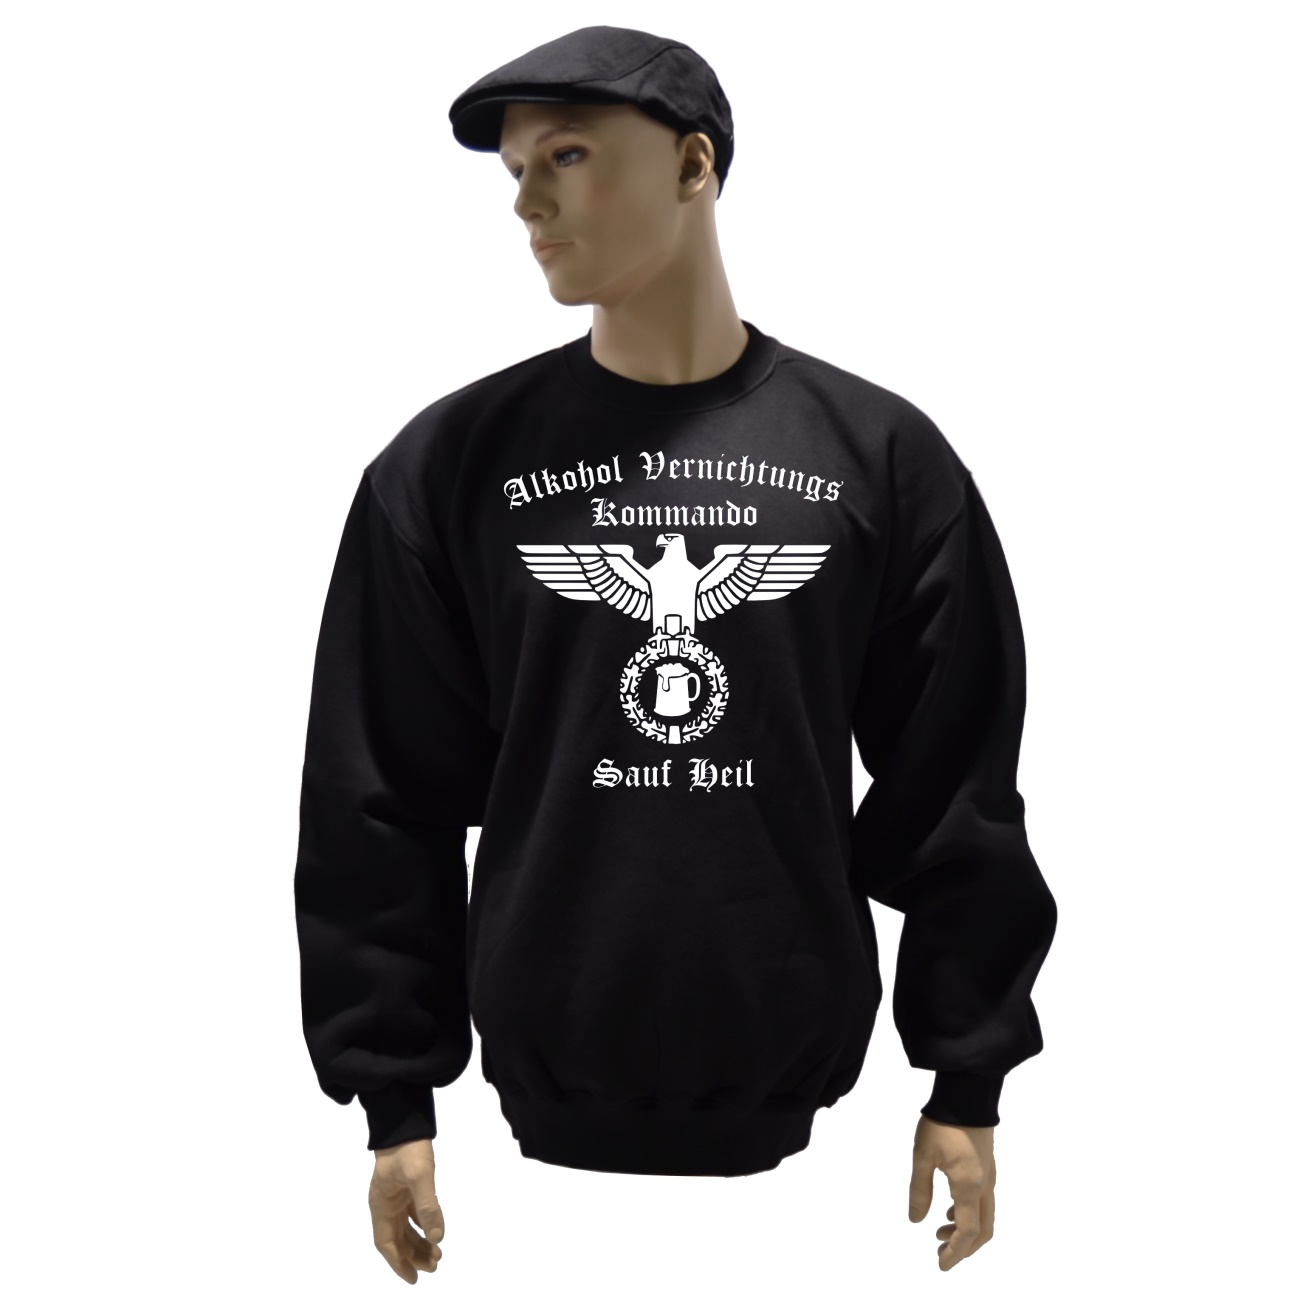 Sweatshirt Alkohol Vernichtungs Kommando G305 RAC bei Thorshop